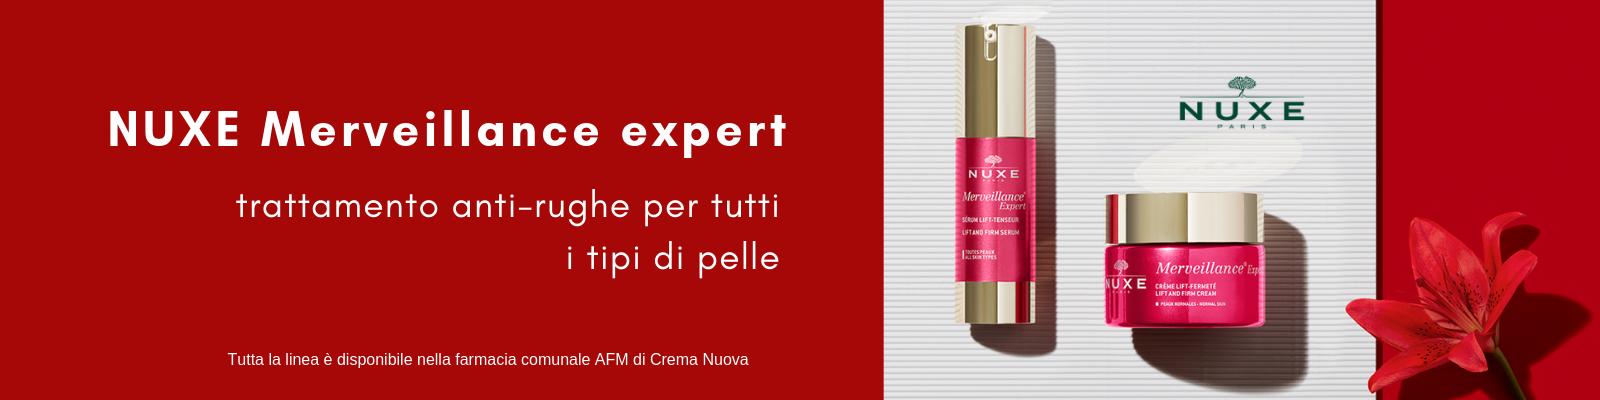 NUXE Merveillance expert, trattamento anti-rughe per tutti i tipi di pelle (2)